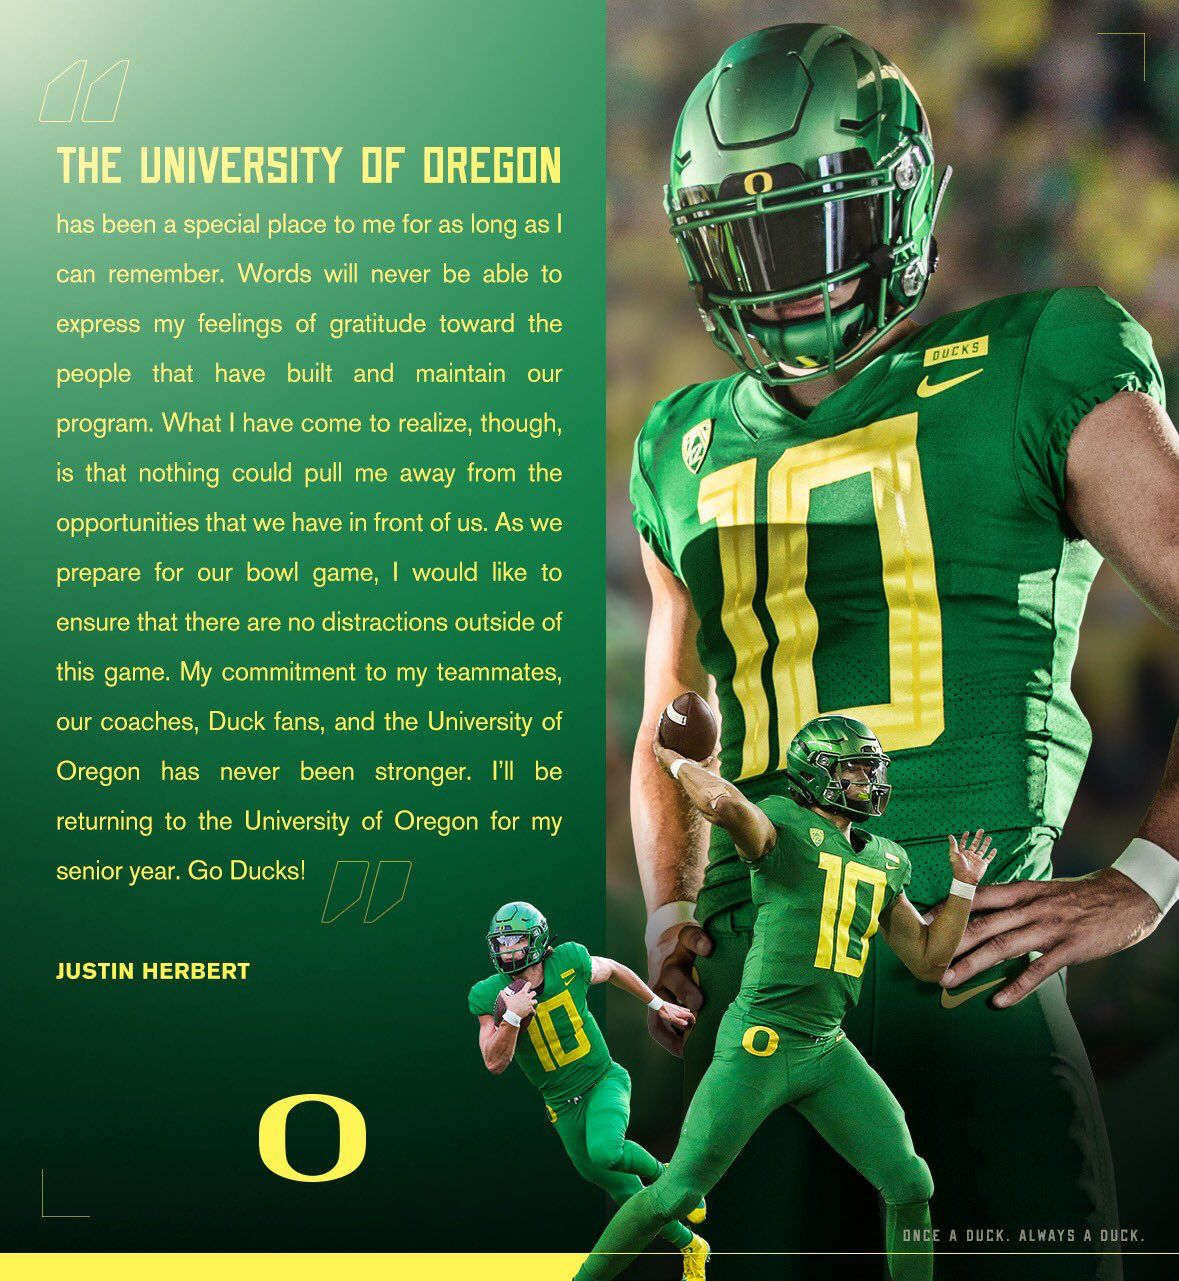 Pin By Tb Design Inspiration On Today S Athletes Oregon Football Oregon Ducks Football Sports Design Inspiration